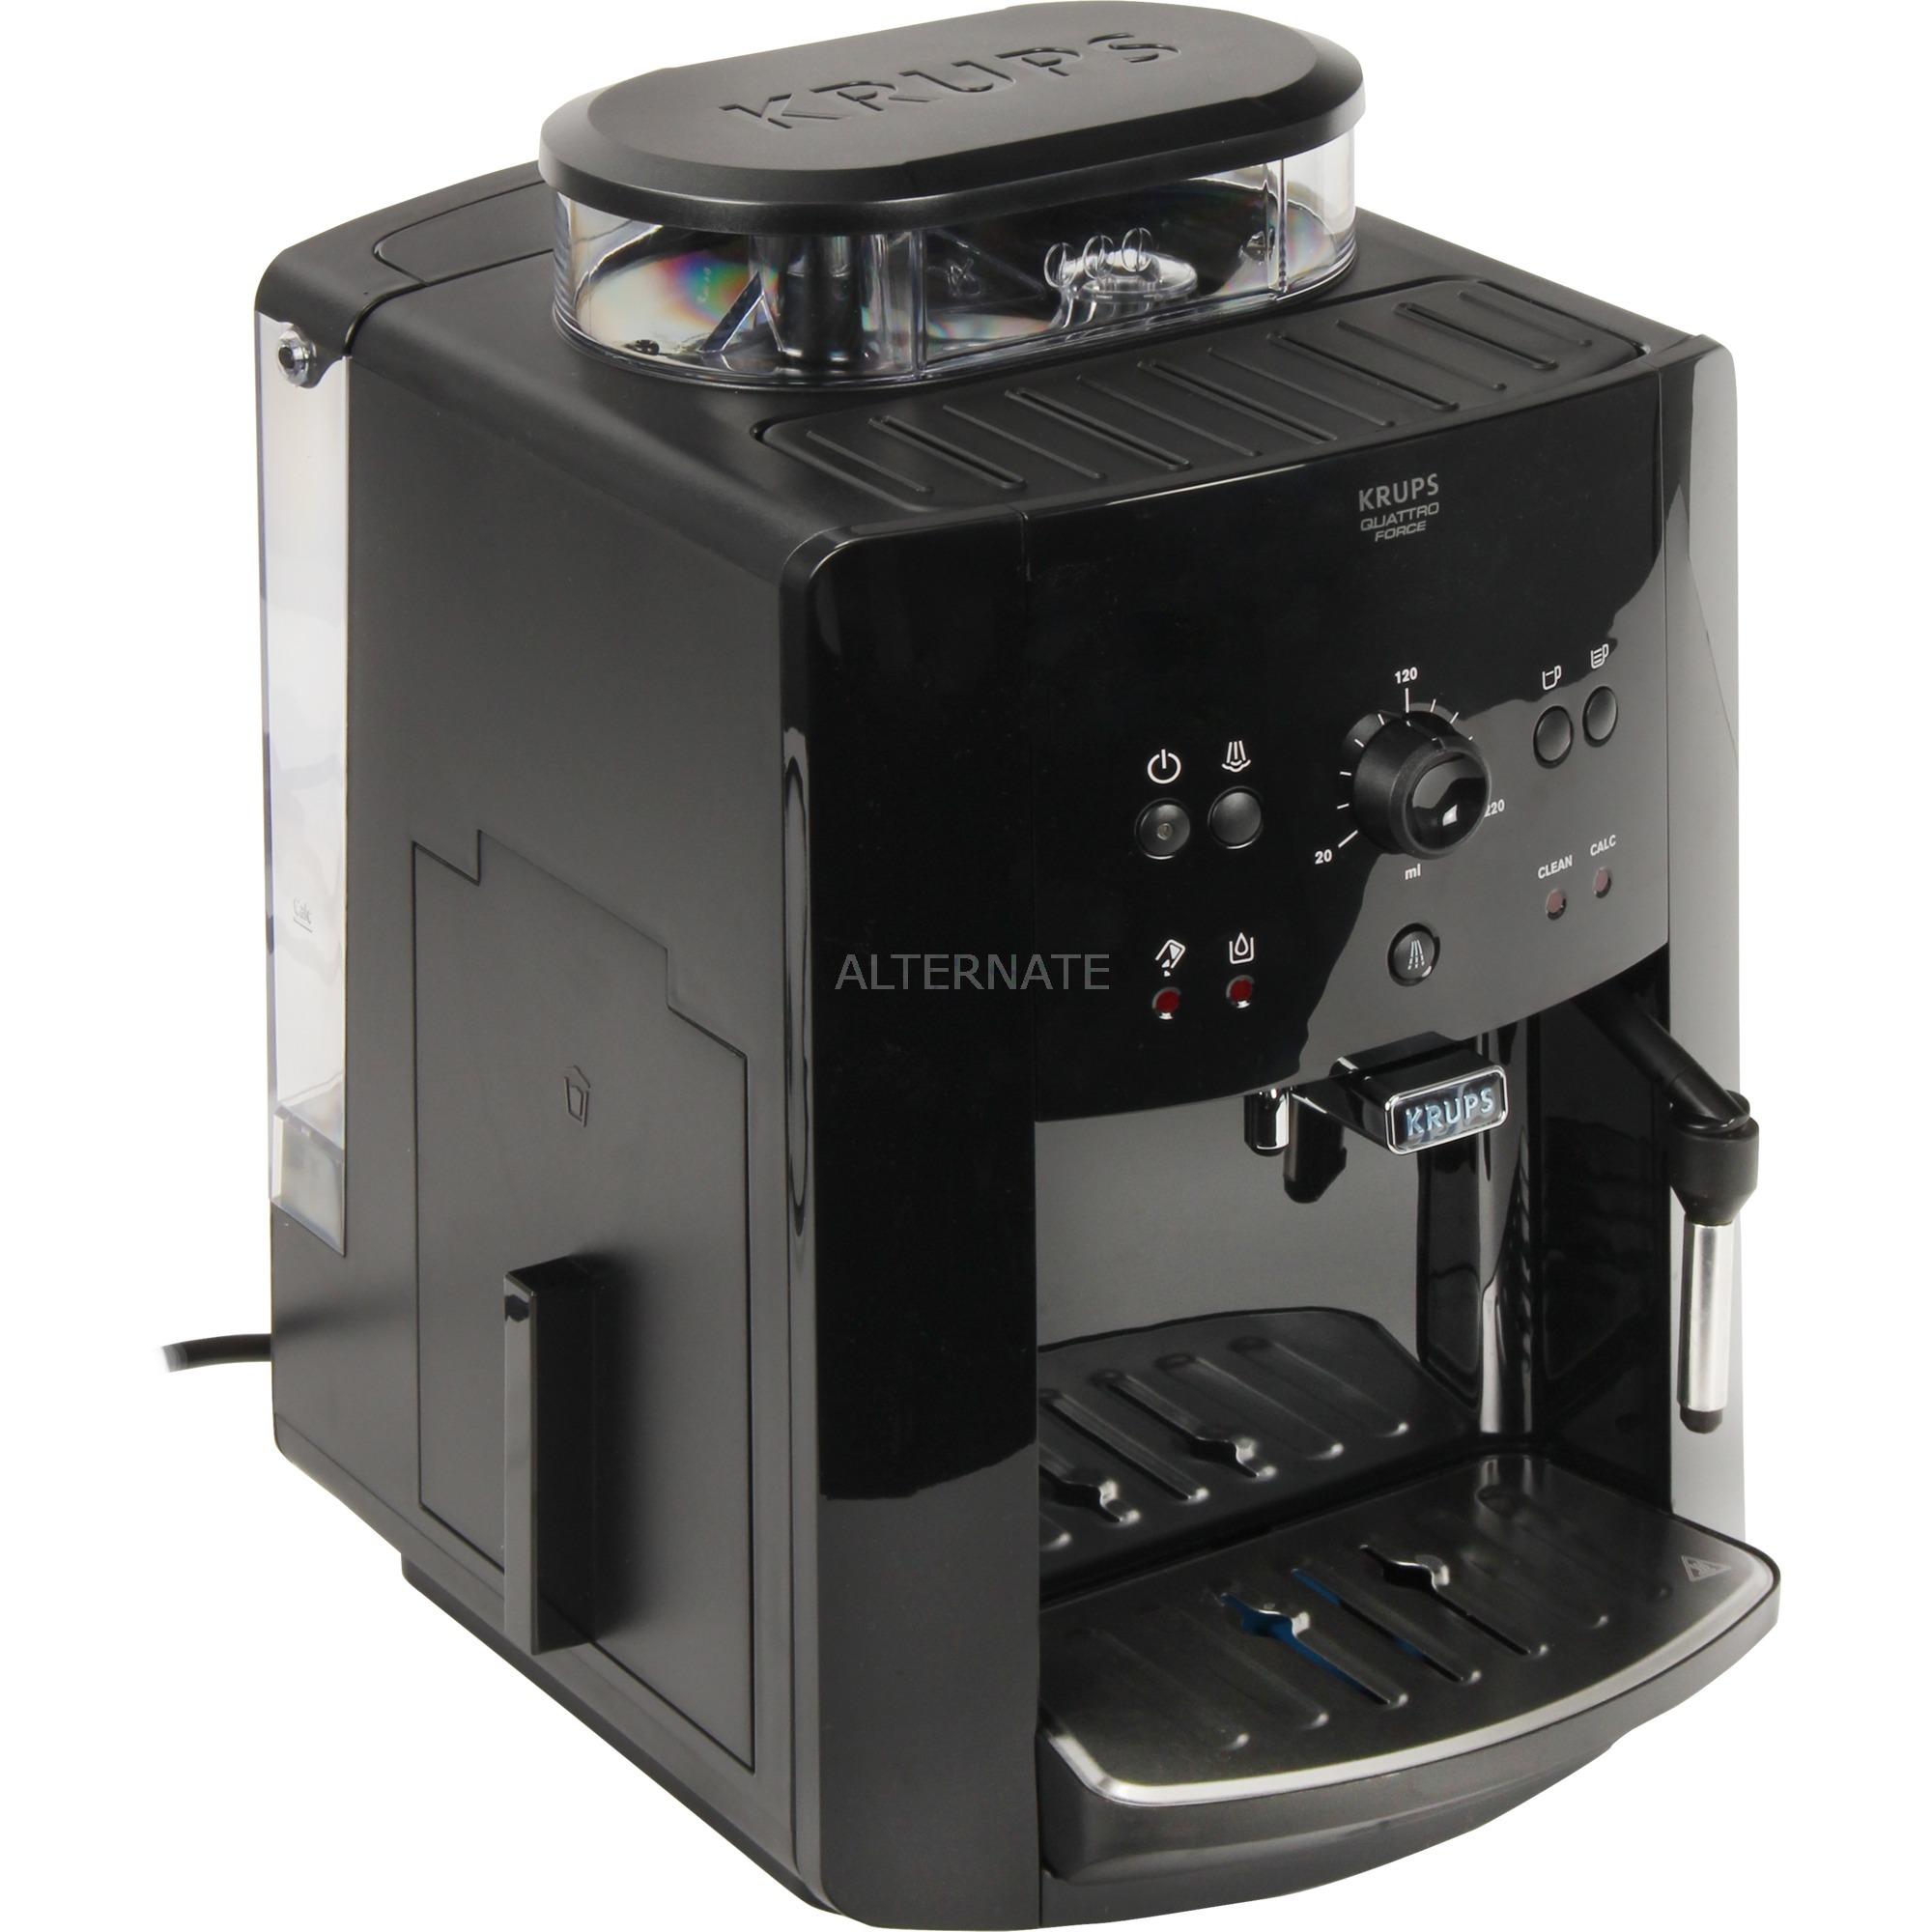 Arabica EA8110 cafetera eléctrica Encimera Máquina espresso 1,7 L Totalmente automática, Superautomática